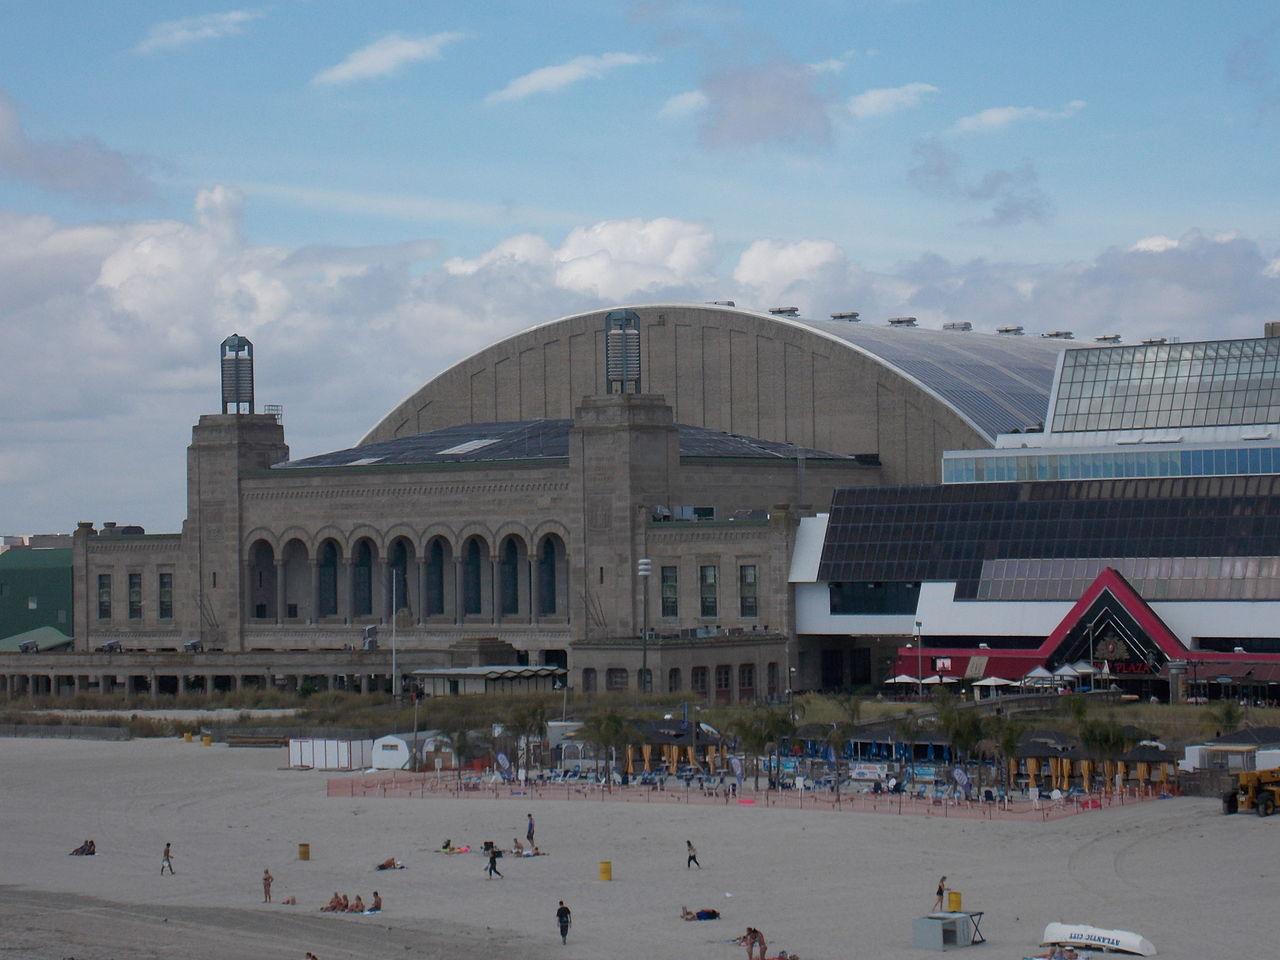 Boardwalk Hall-Best Attraction in Atlantic City